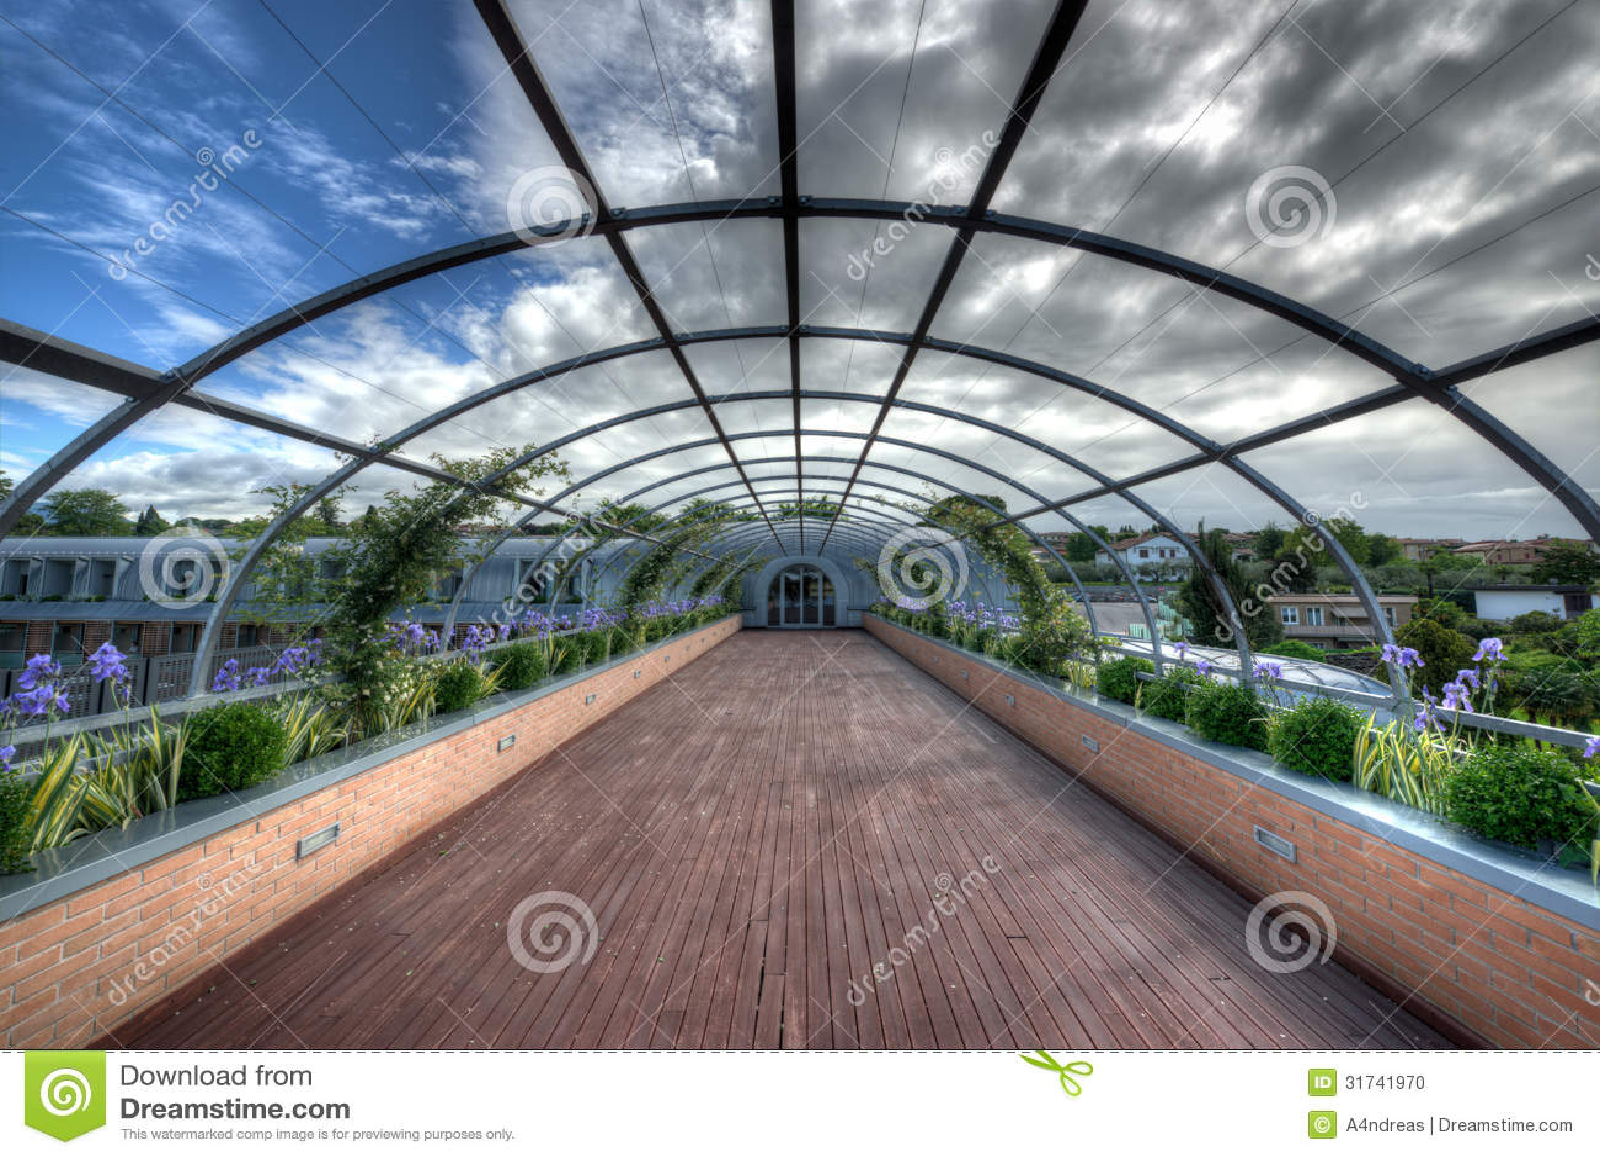 Corridor Roof Design: Outdoor Corridor Pergola Stock Photo